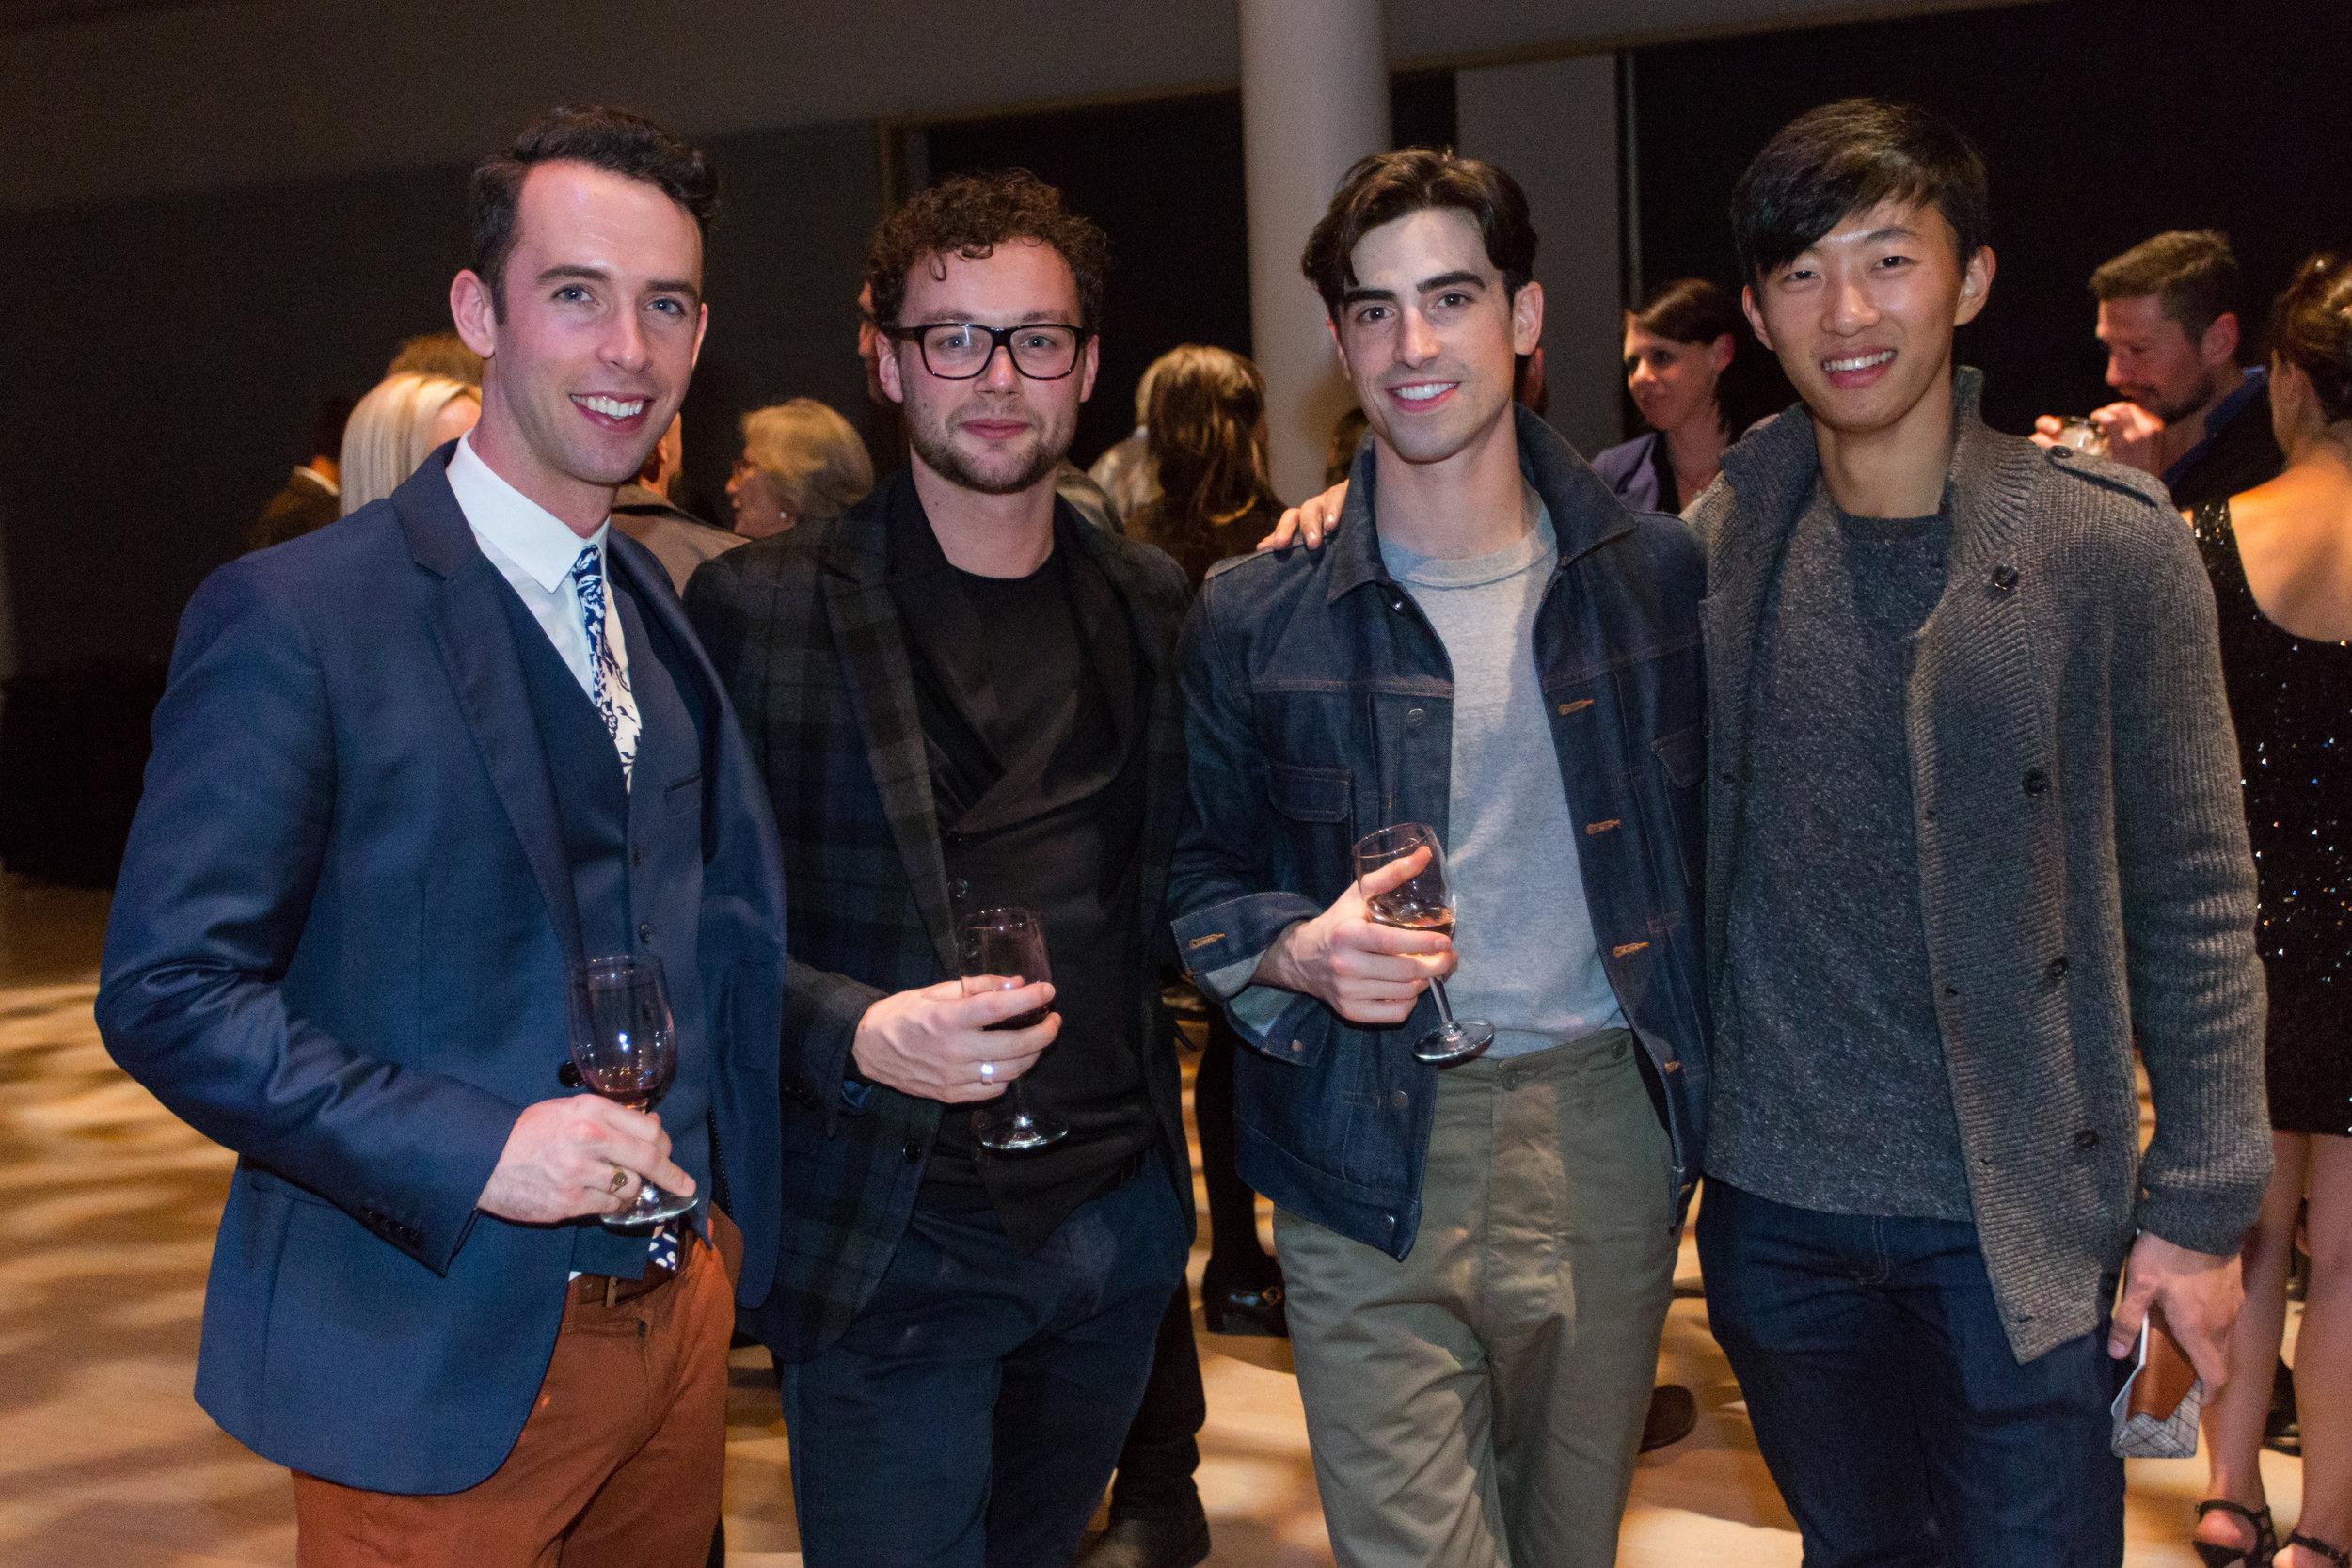 Ben Needham-Wood, Liam Scarlett, Joseph Walsh, Wei Wang.photo: Alex Reneff-Olson